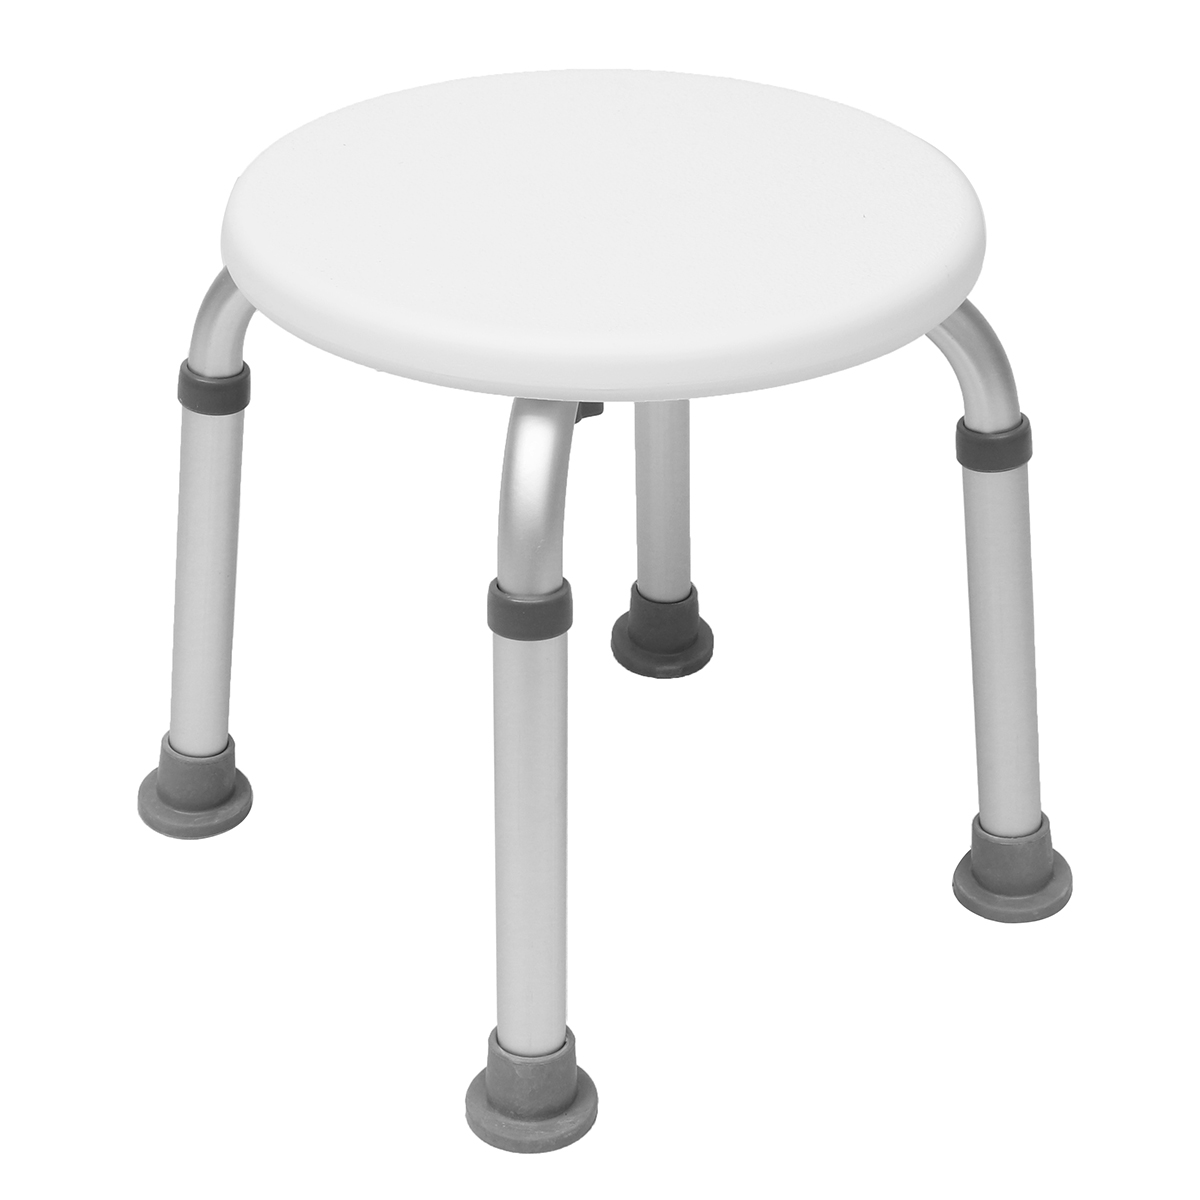 Bath Height Adjustable Elderly Bath Shower Chair Kids Furniture Shower Stool Round Chair Seat Non Slip Disabled Toilet Home Old